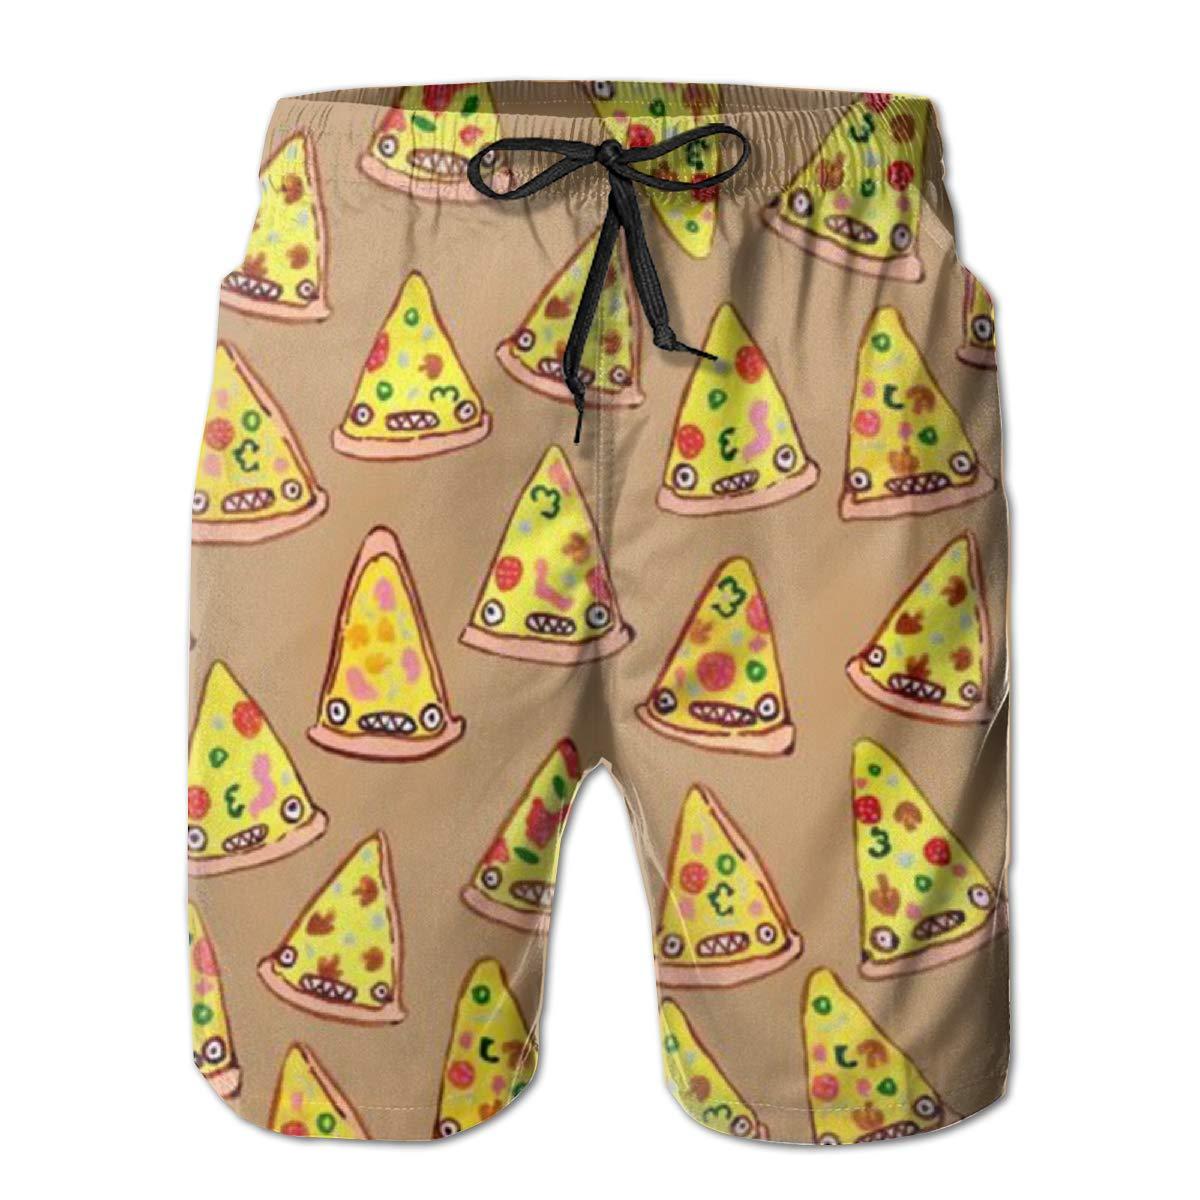 WMDJEG Ham and Pineapple Pizza Mens Summer Beachwear Sports Running Swim Board Shorts Mesh Lining